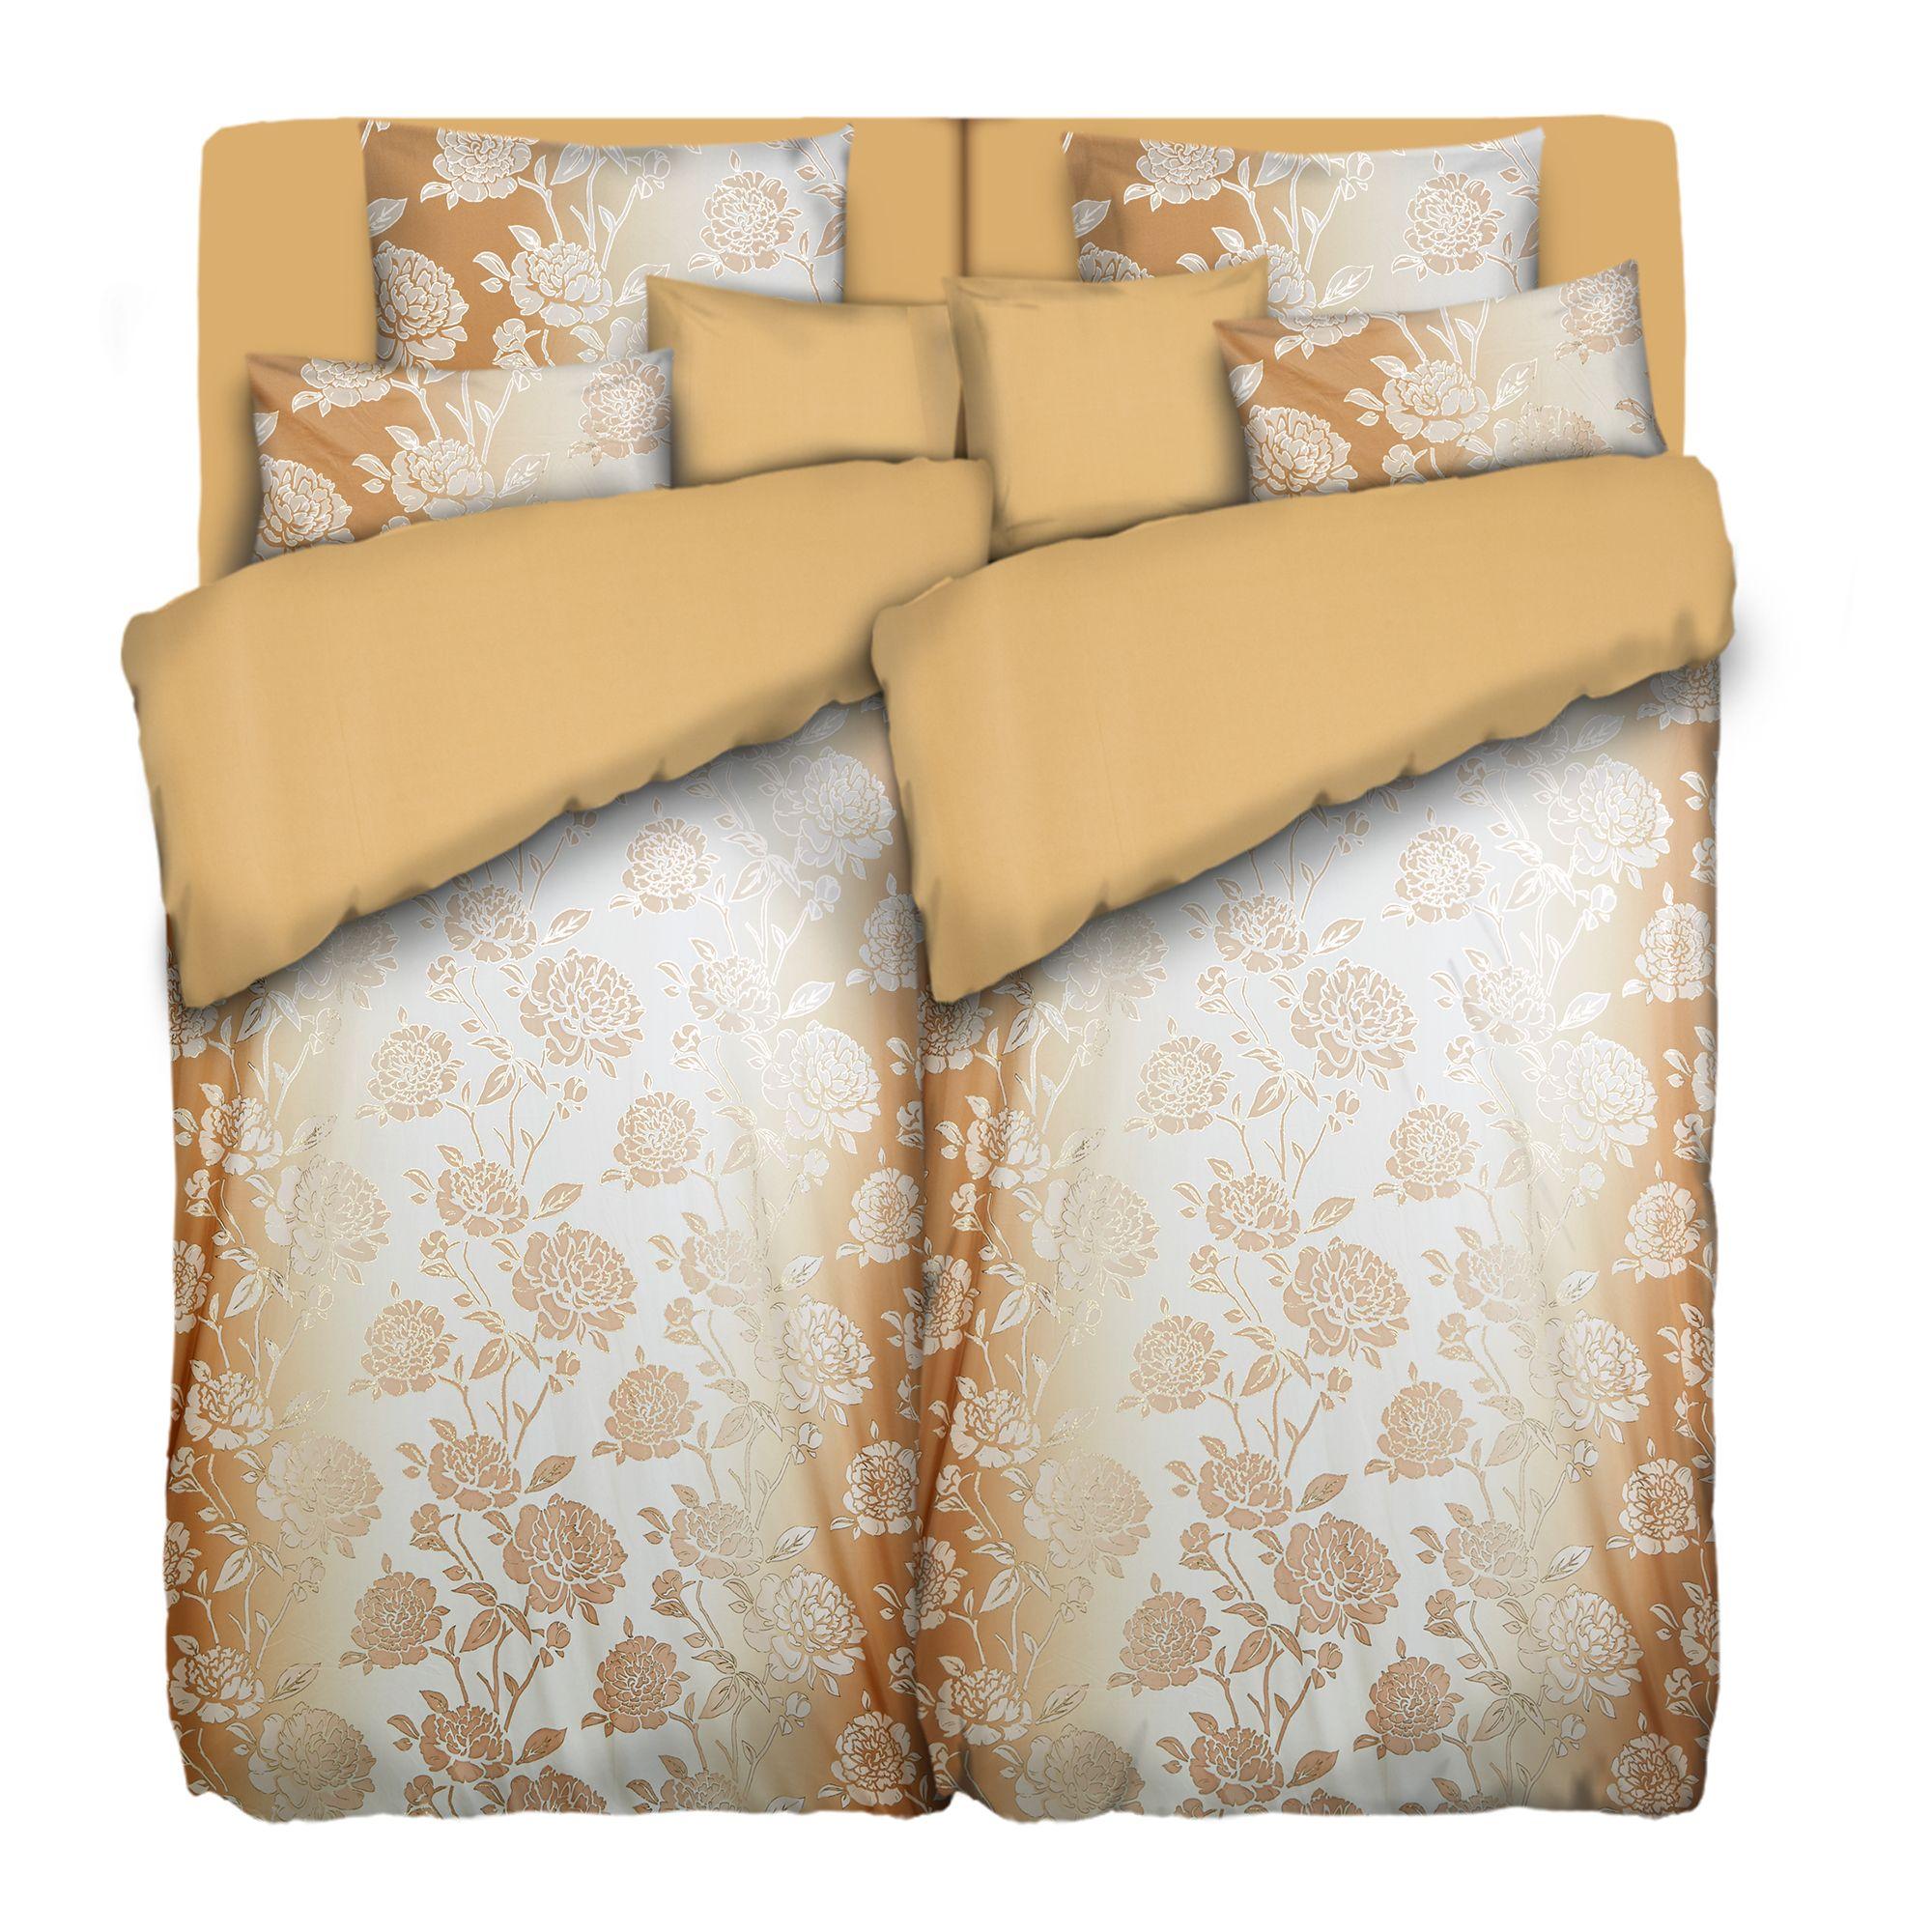 Betten Mode Bettwäsche Braune Blüten Neu Ovp Bettwäschegarnituren